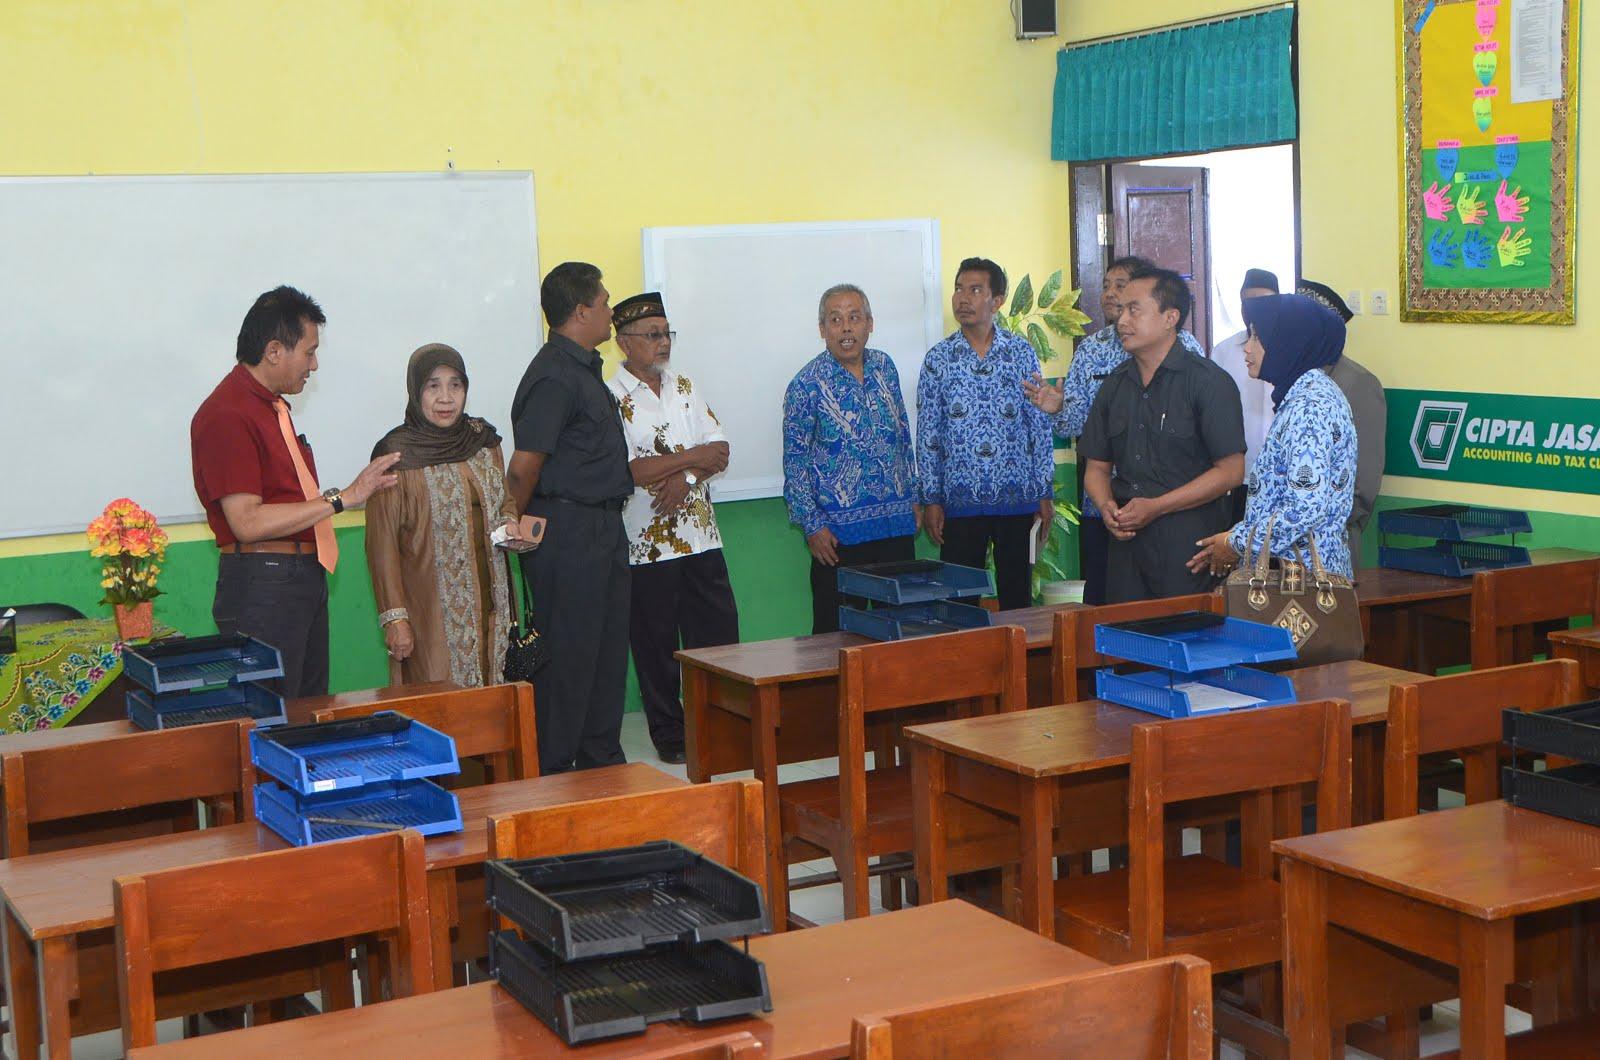 Cipta Jasatama Accounting and Tax Class Program